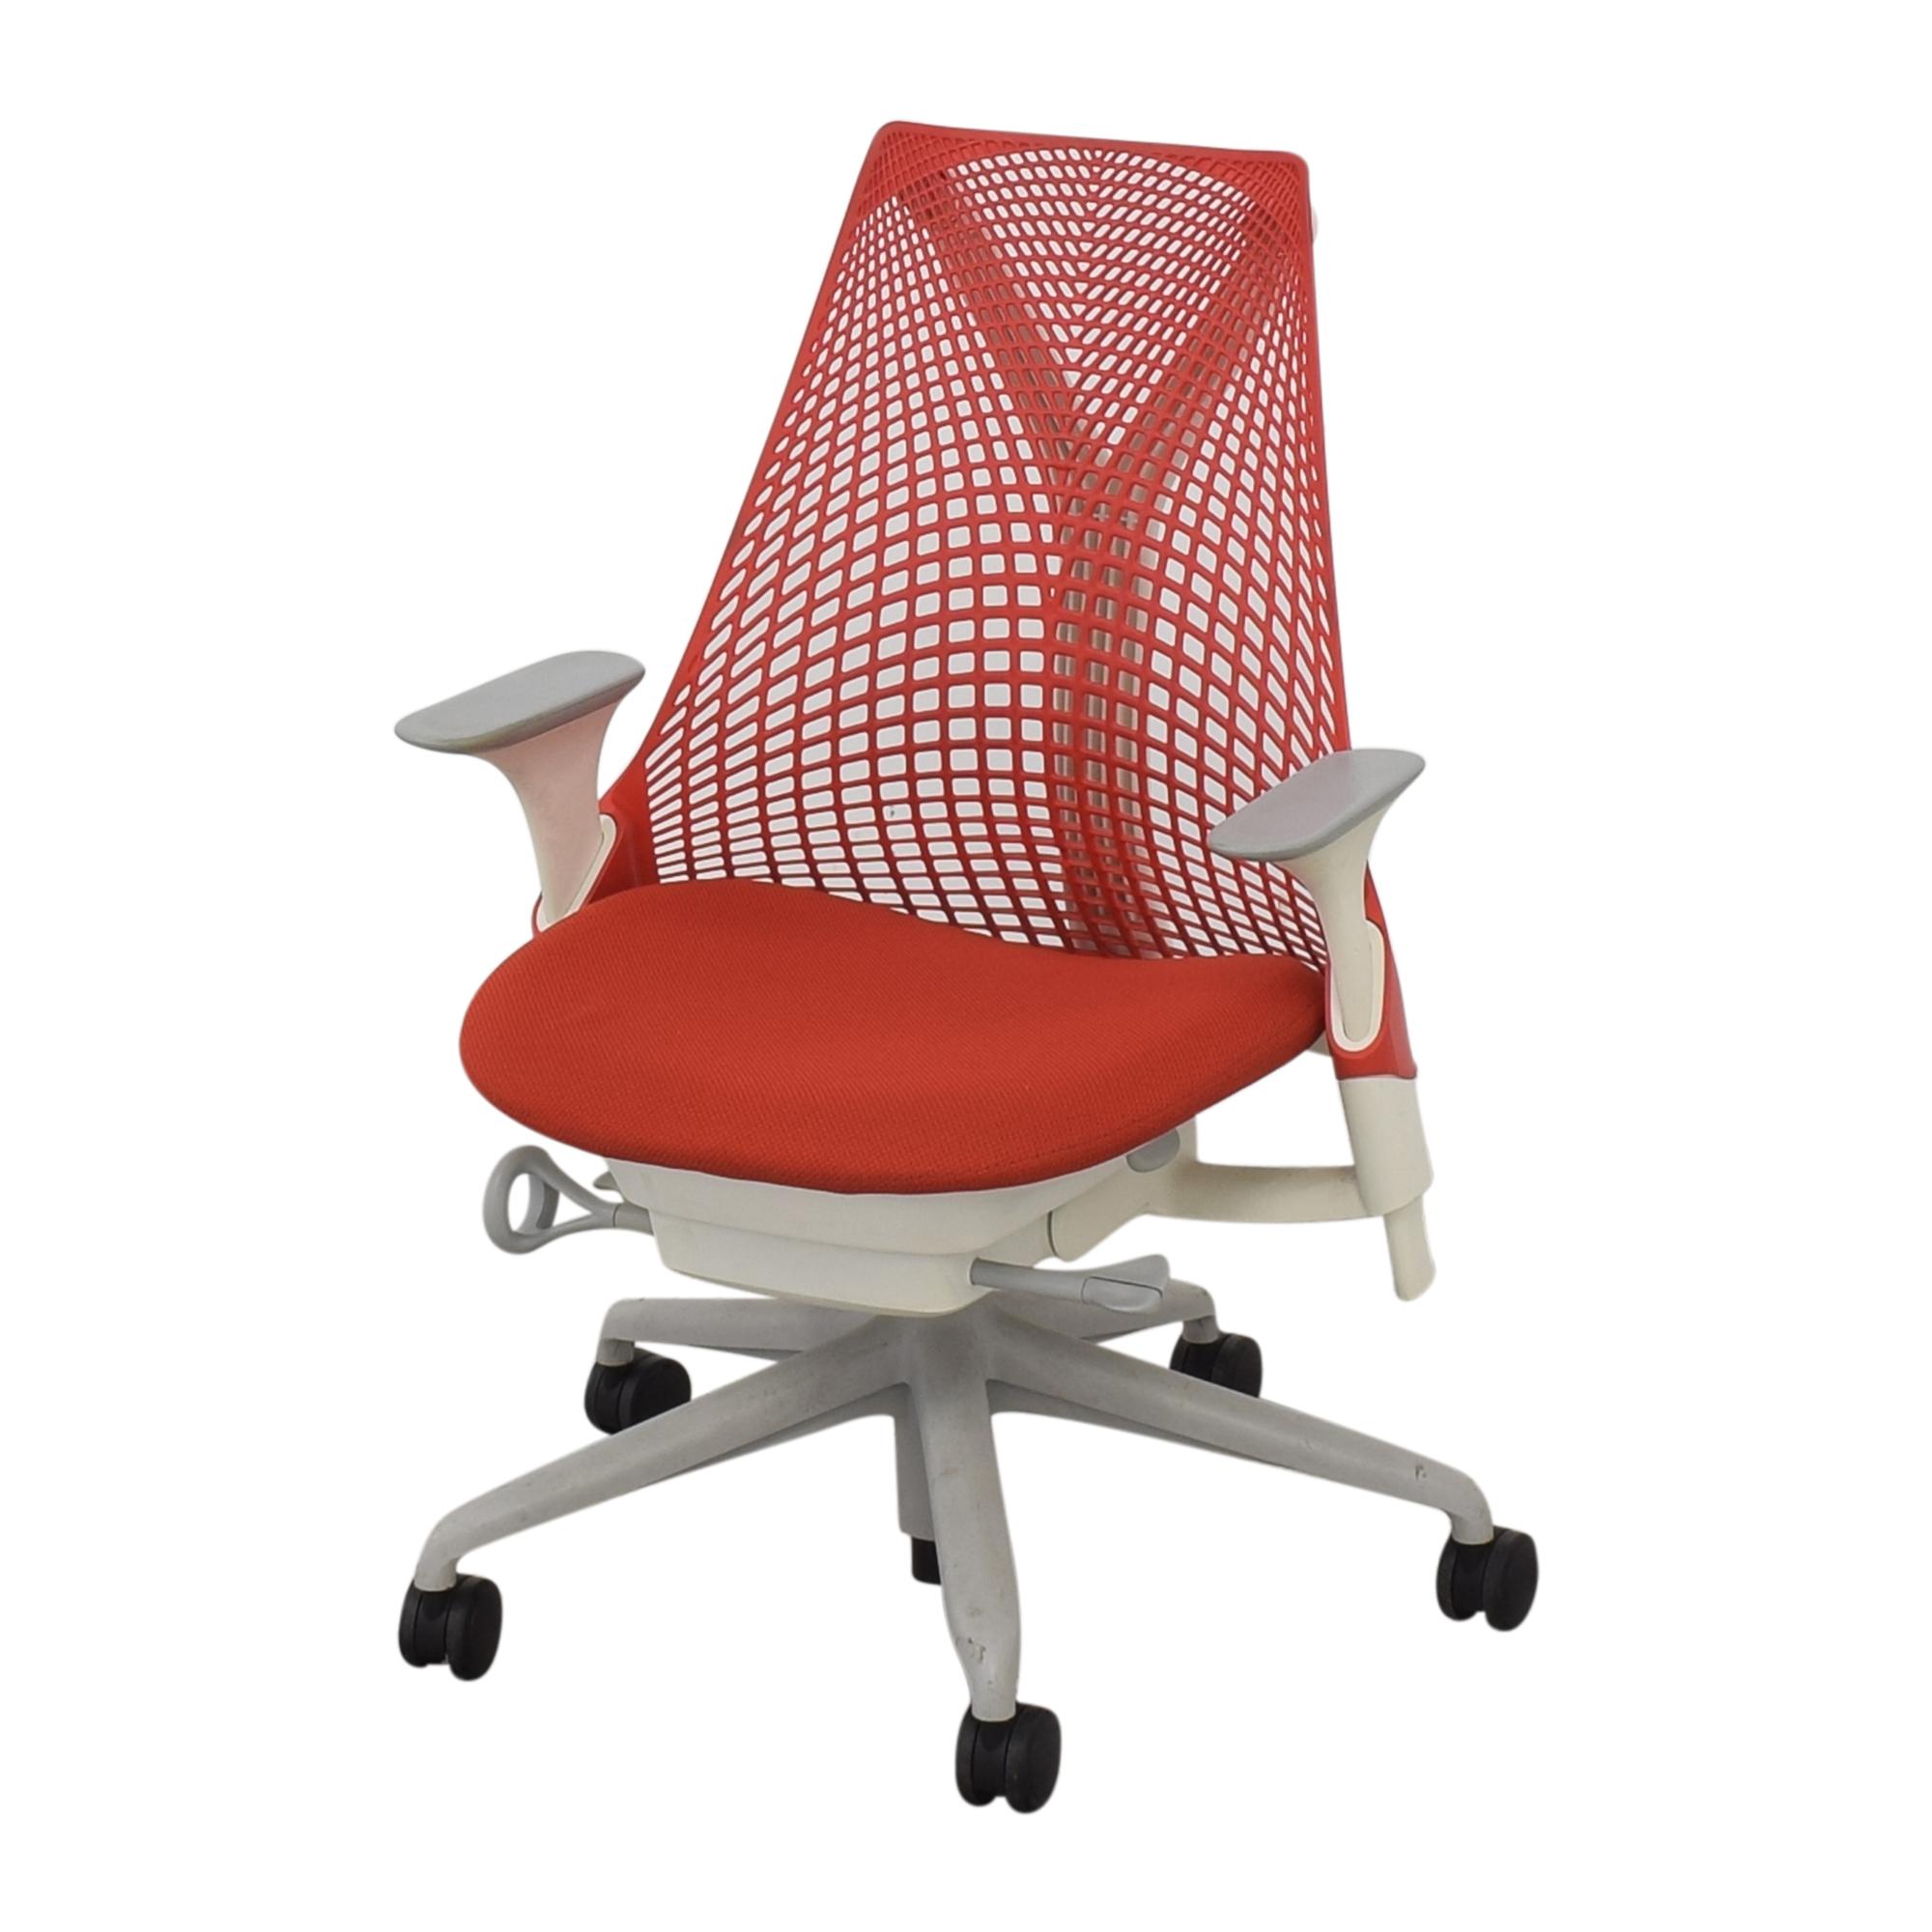 Herman Miller Herman Miller Sayl Chair nj